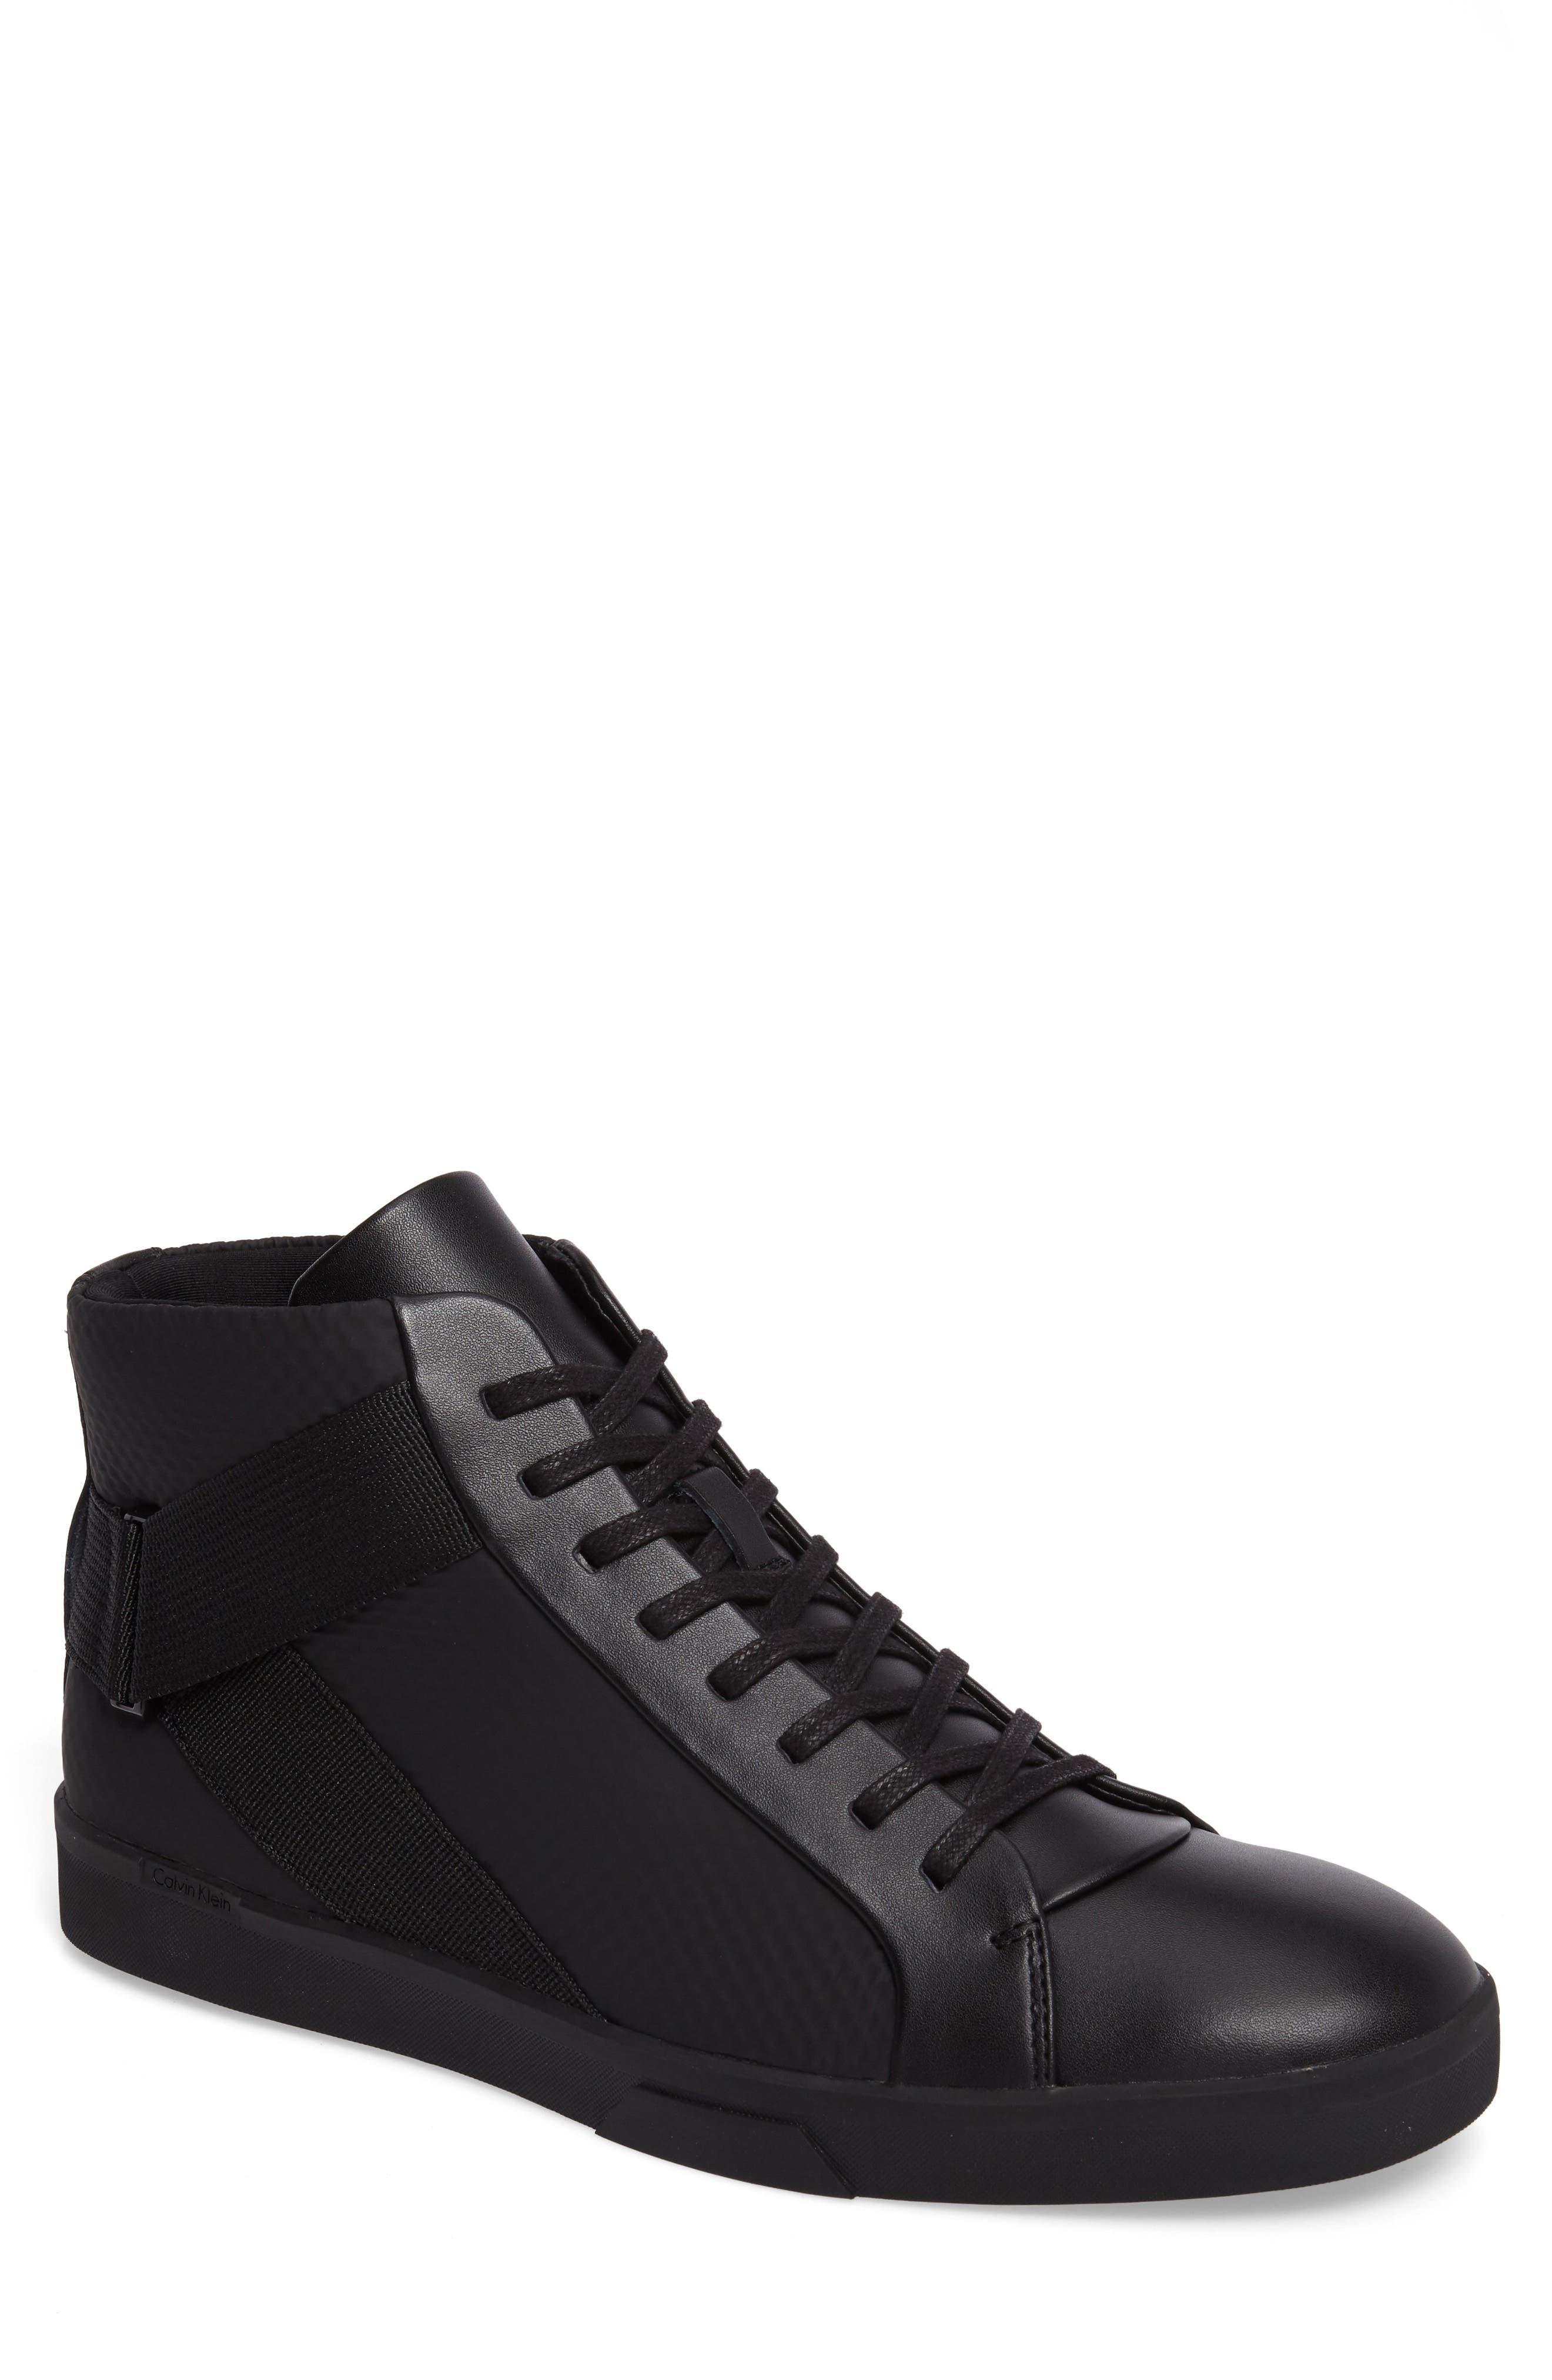 Irvin Sneaker,                         Main,                         color, Black Leather